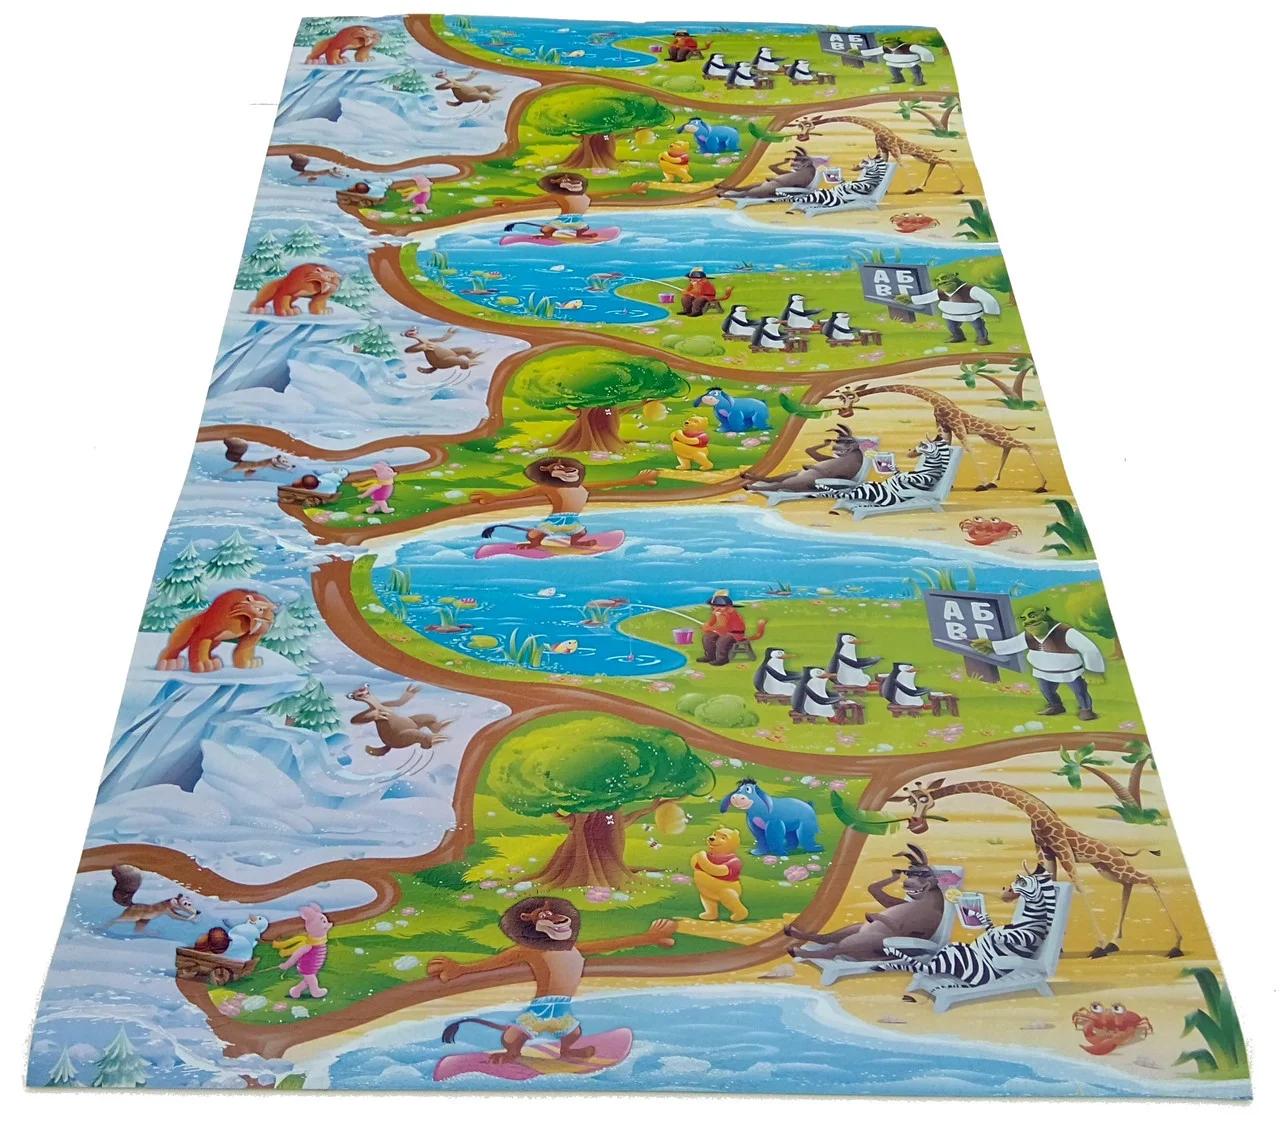 Детский коврик 1500х1200х8мм теплоизоляционный, развивающий, игровой коврик